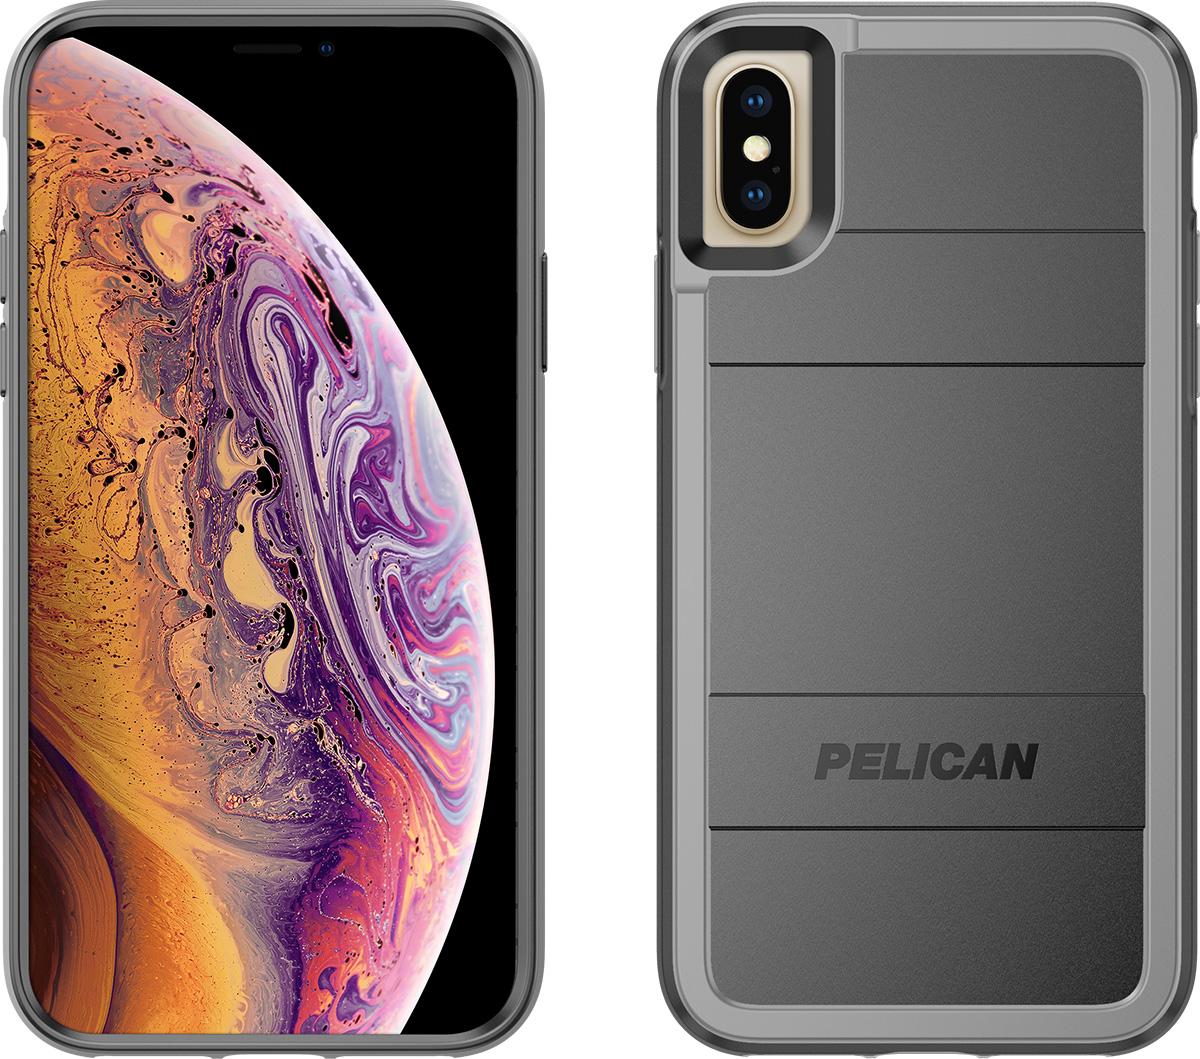 pelican iphone xs protector magnetic mount